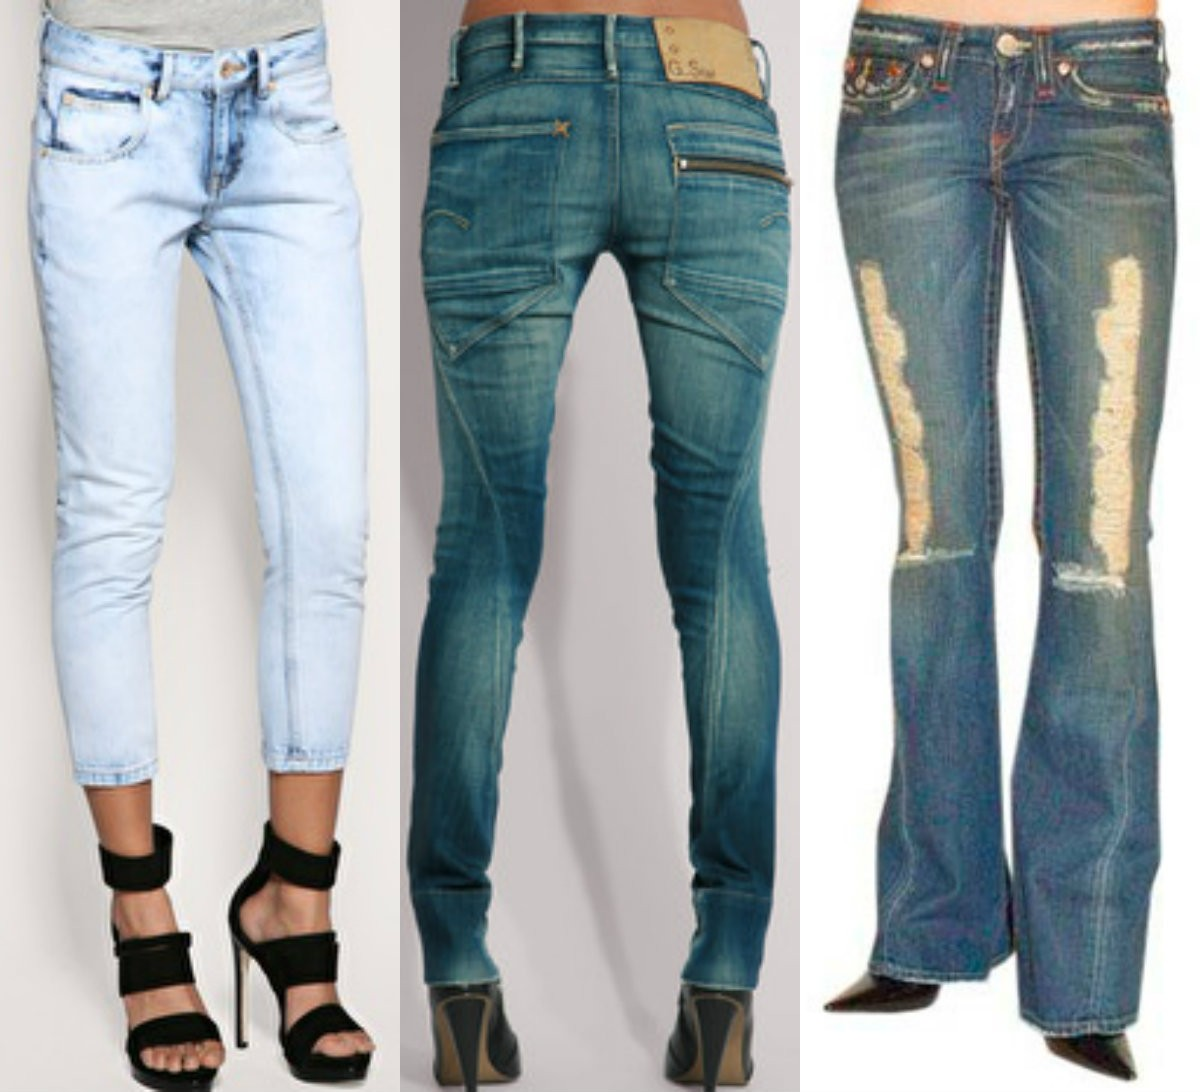 Twisted jeans - джинсы твистед для женщин